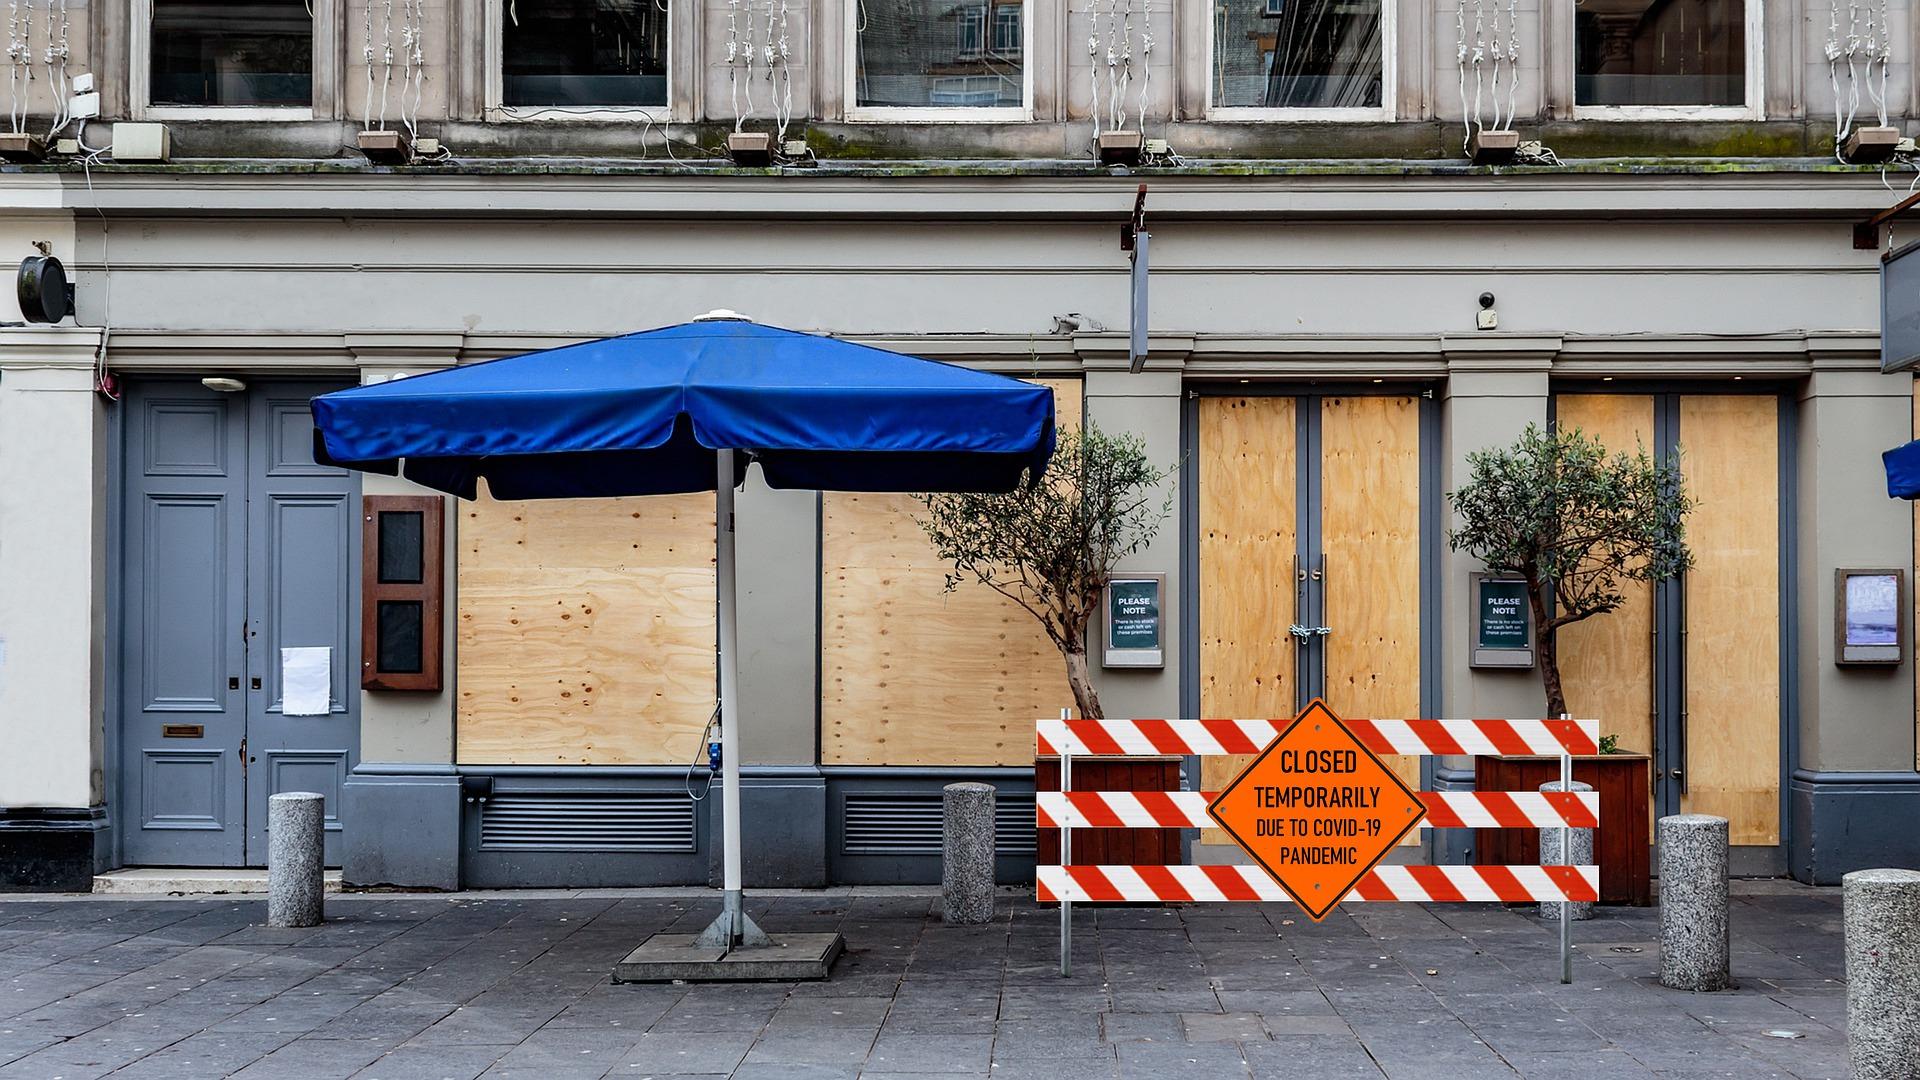 Restaurant wegen Covid19/Corona geschlossen